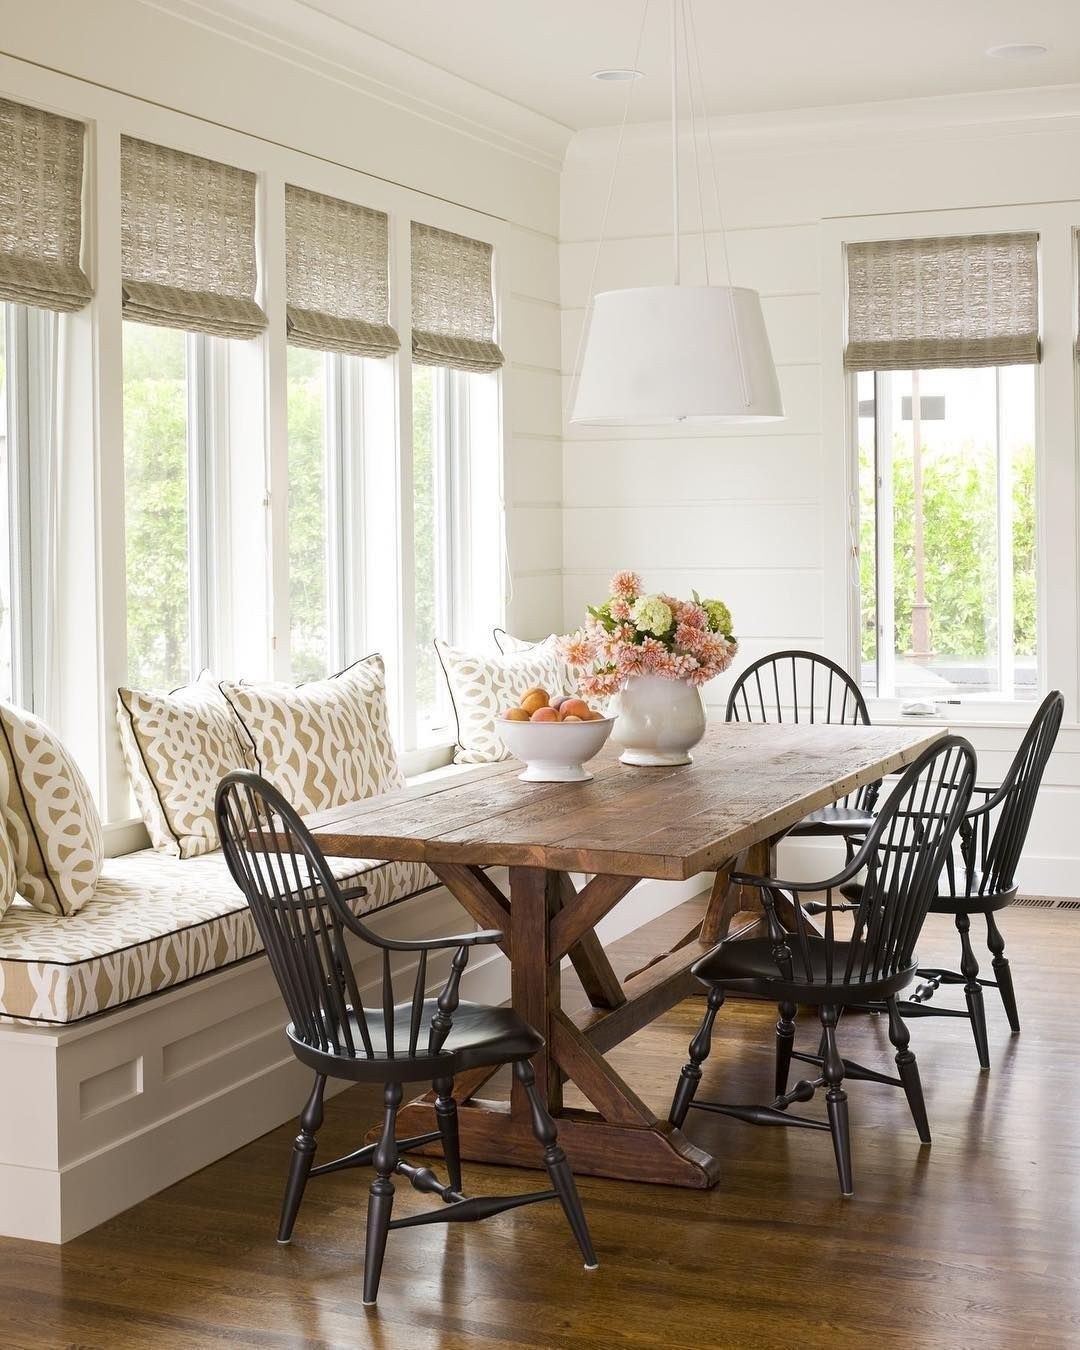 40 cozy modern farmhouse sunroom designs farmhouse style home rh pinterest com